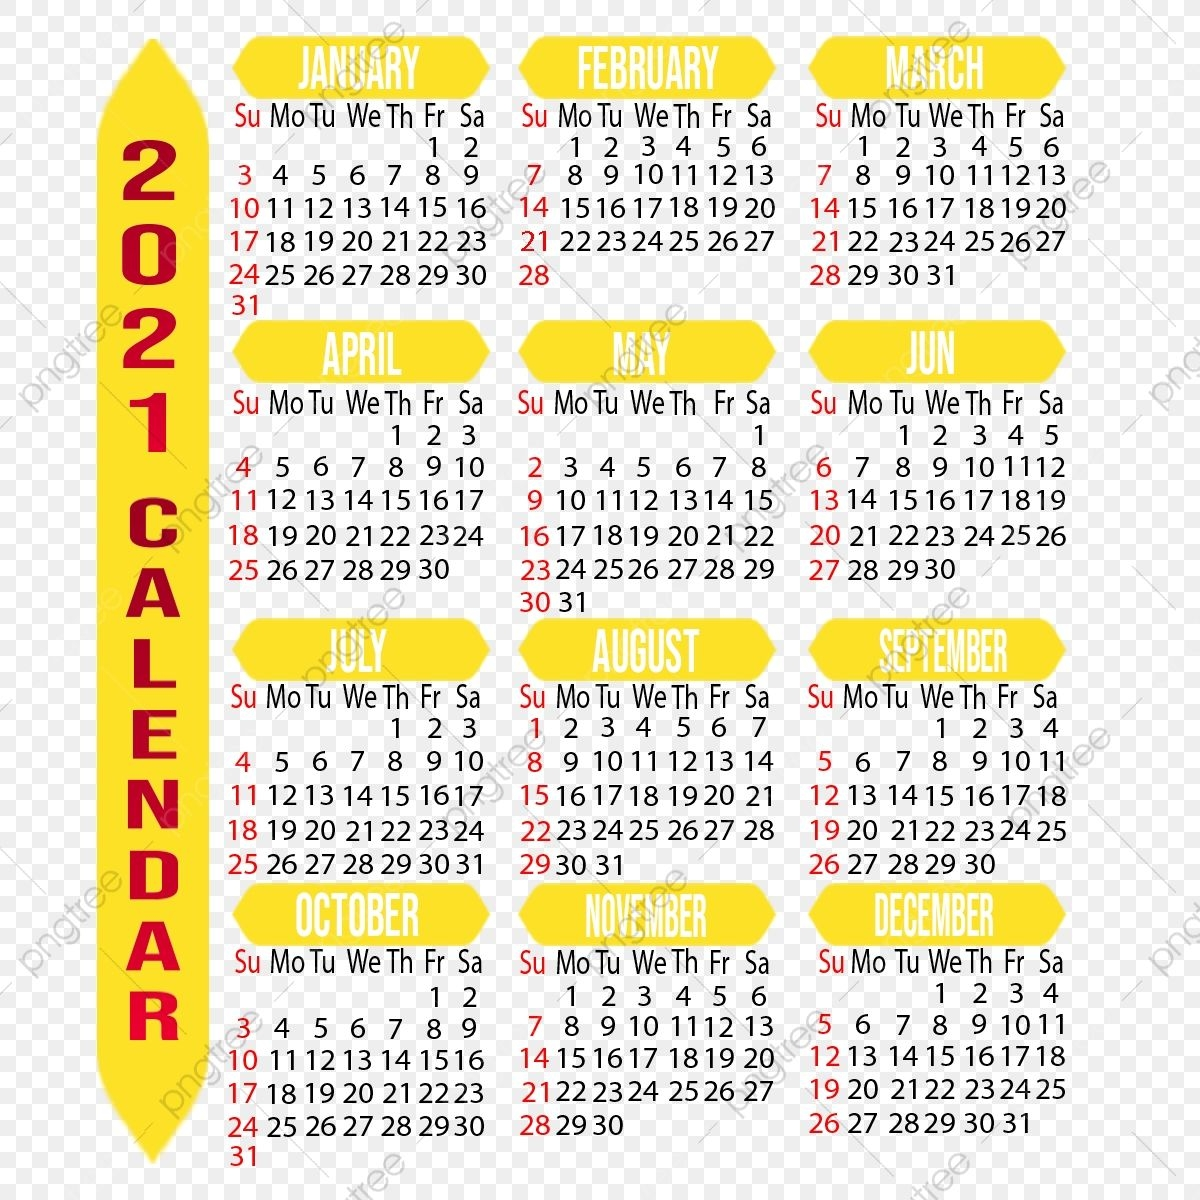 Customizable 2021 Calendar, Year, Month, Week Png